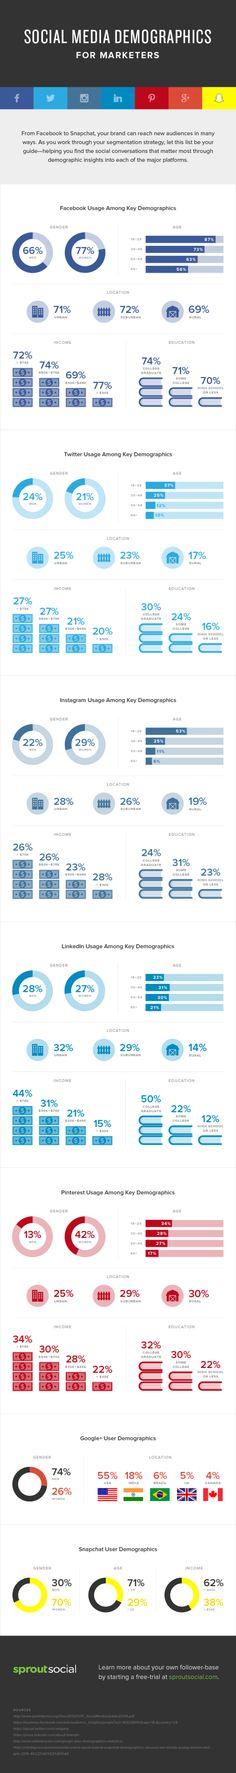 Social-Demographics_infographic